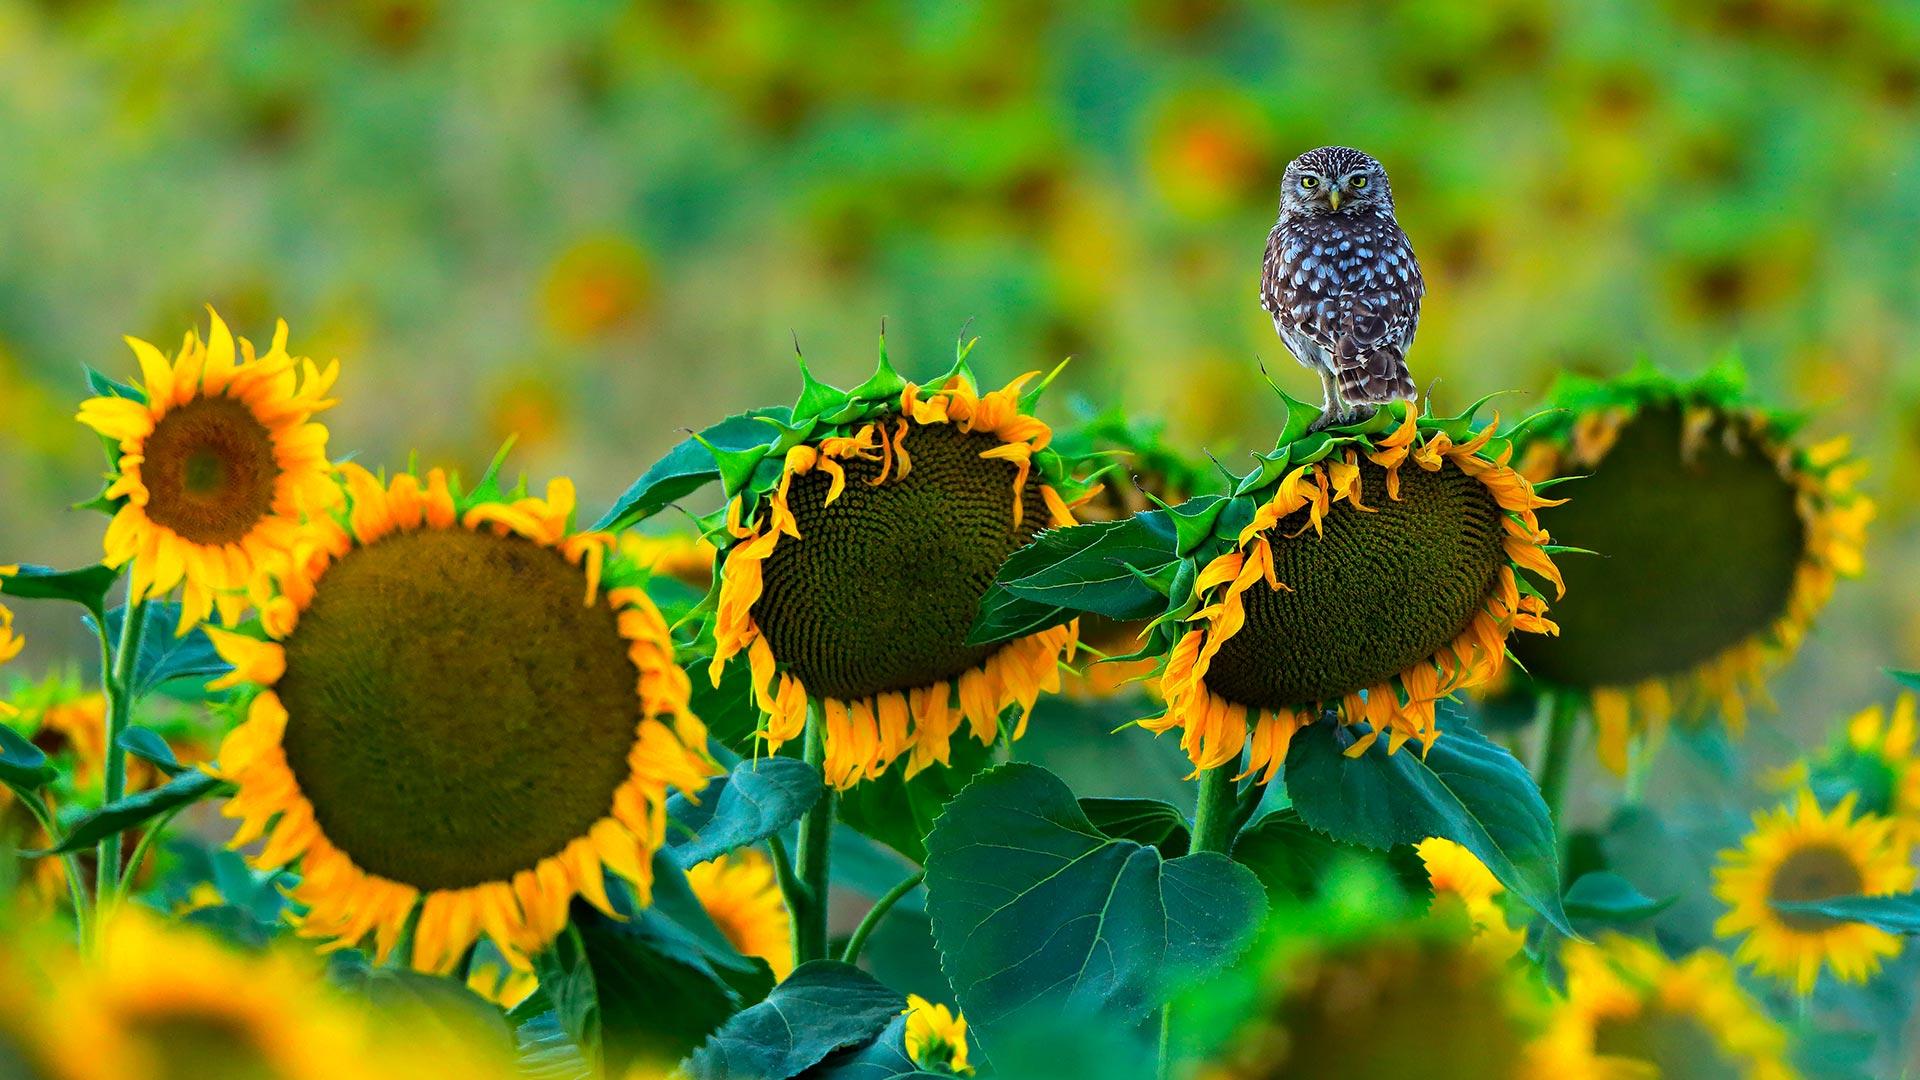 OwlSunflowers_ZH-CN8154999485